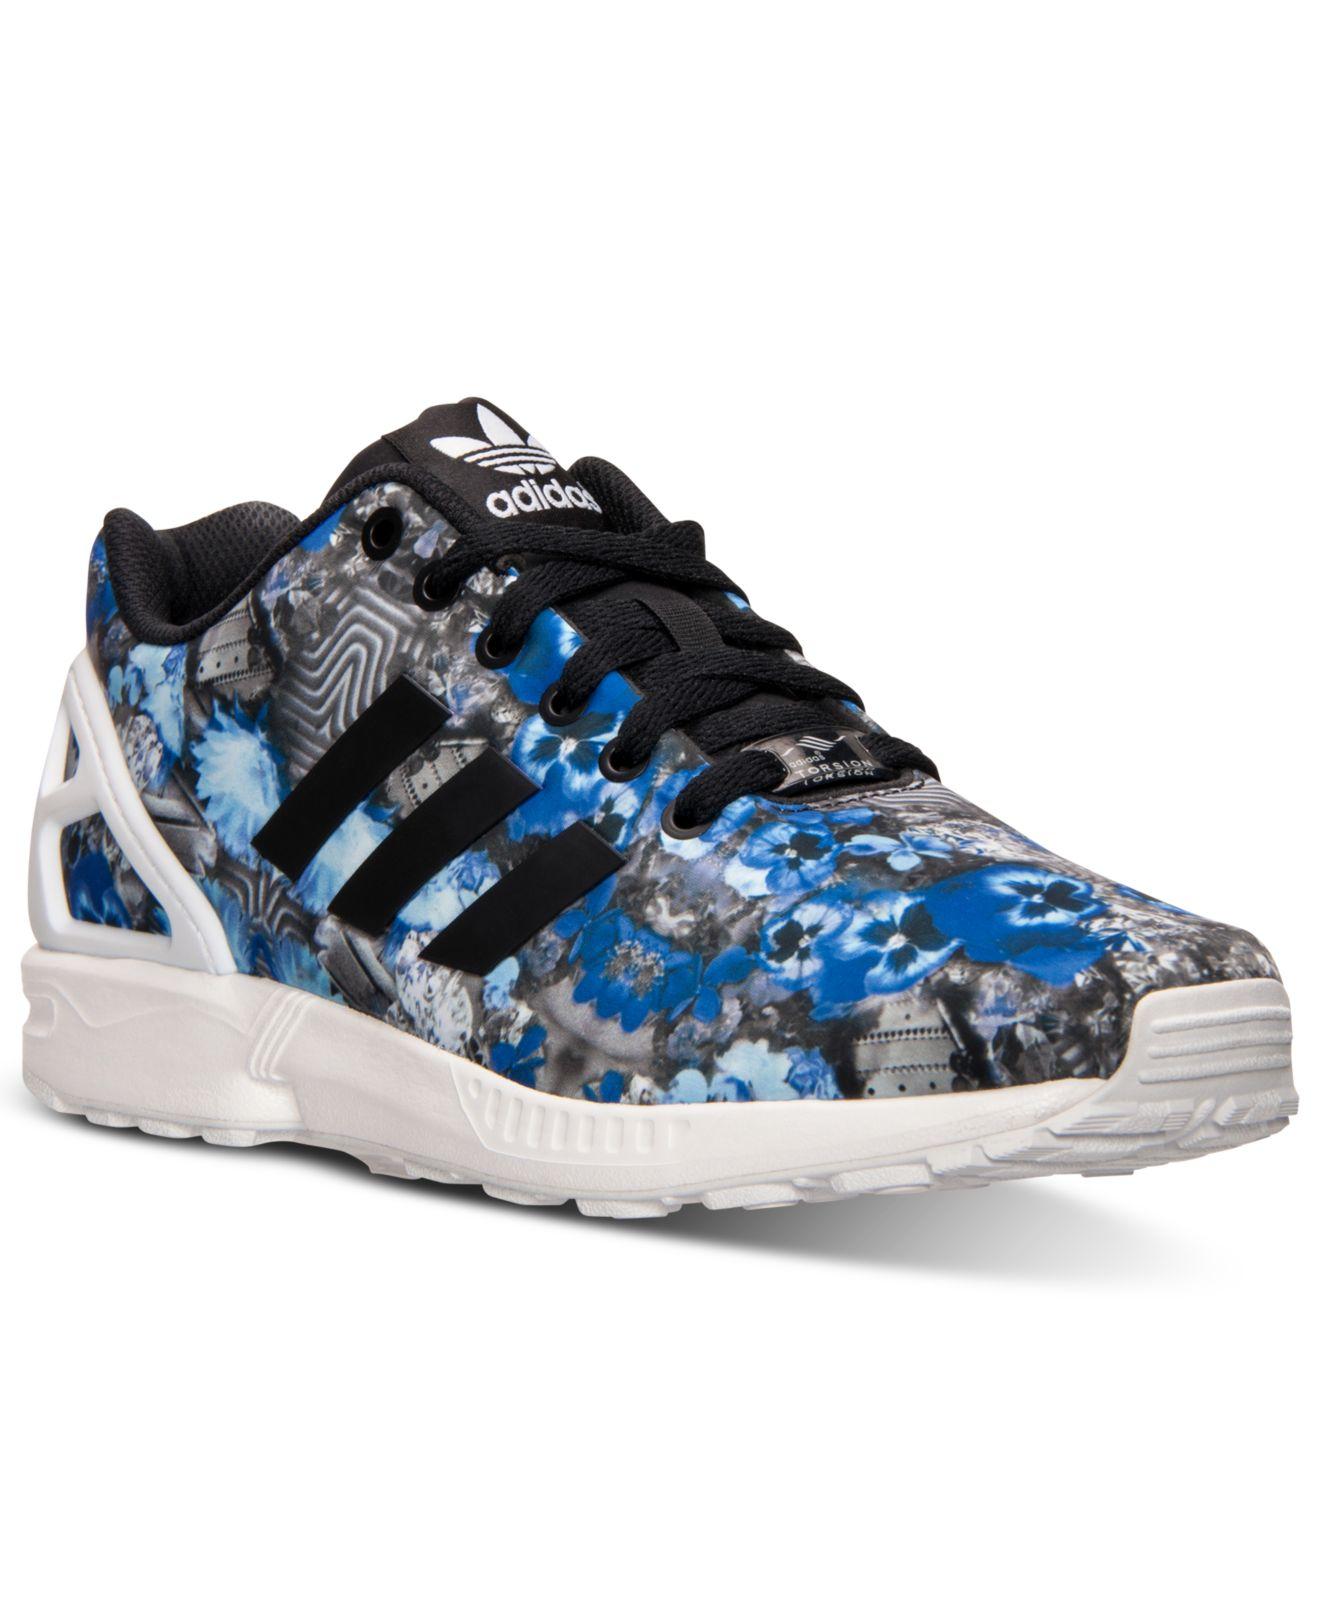 adidas zx flux shoes for men